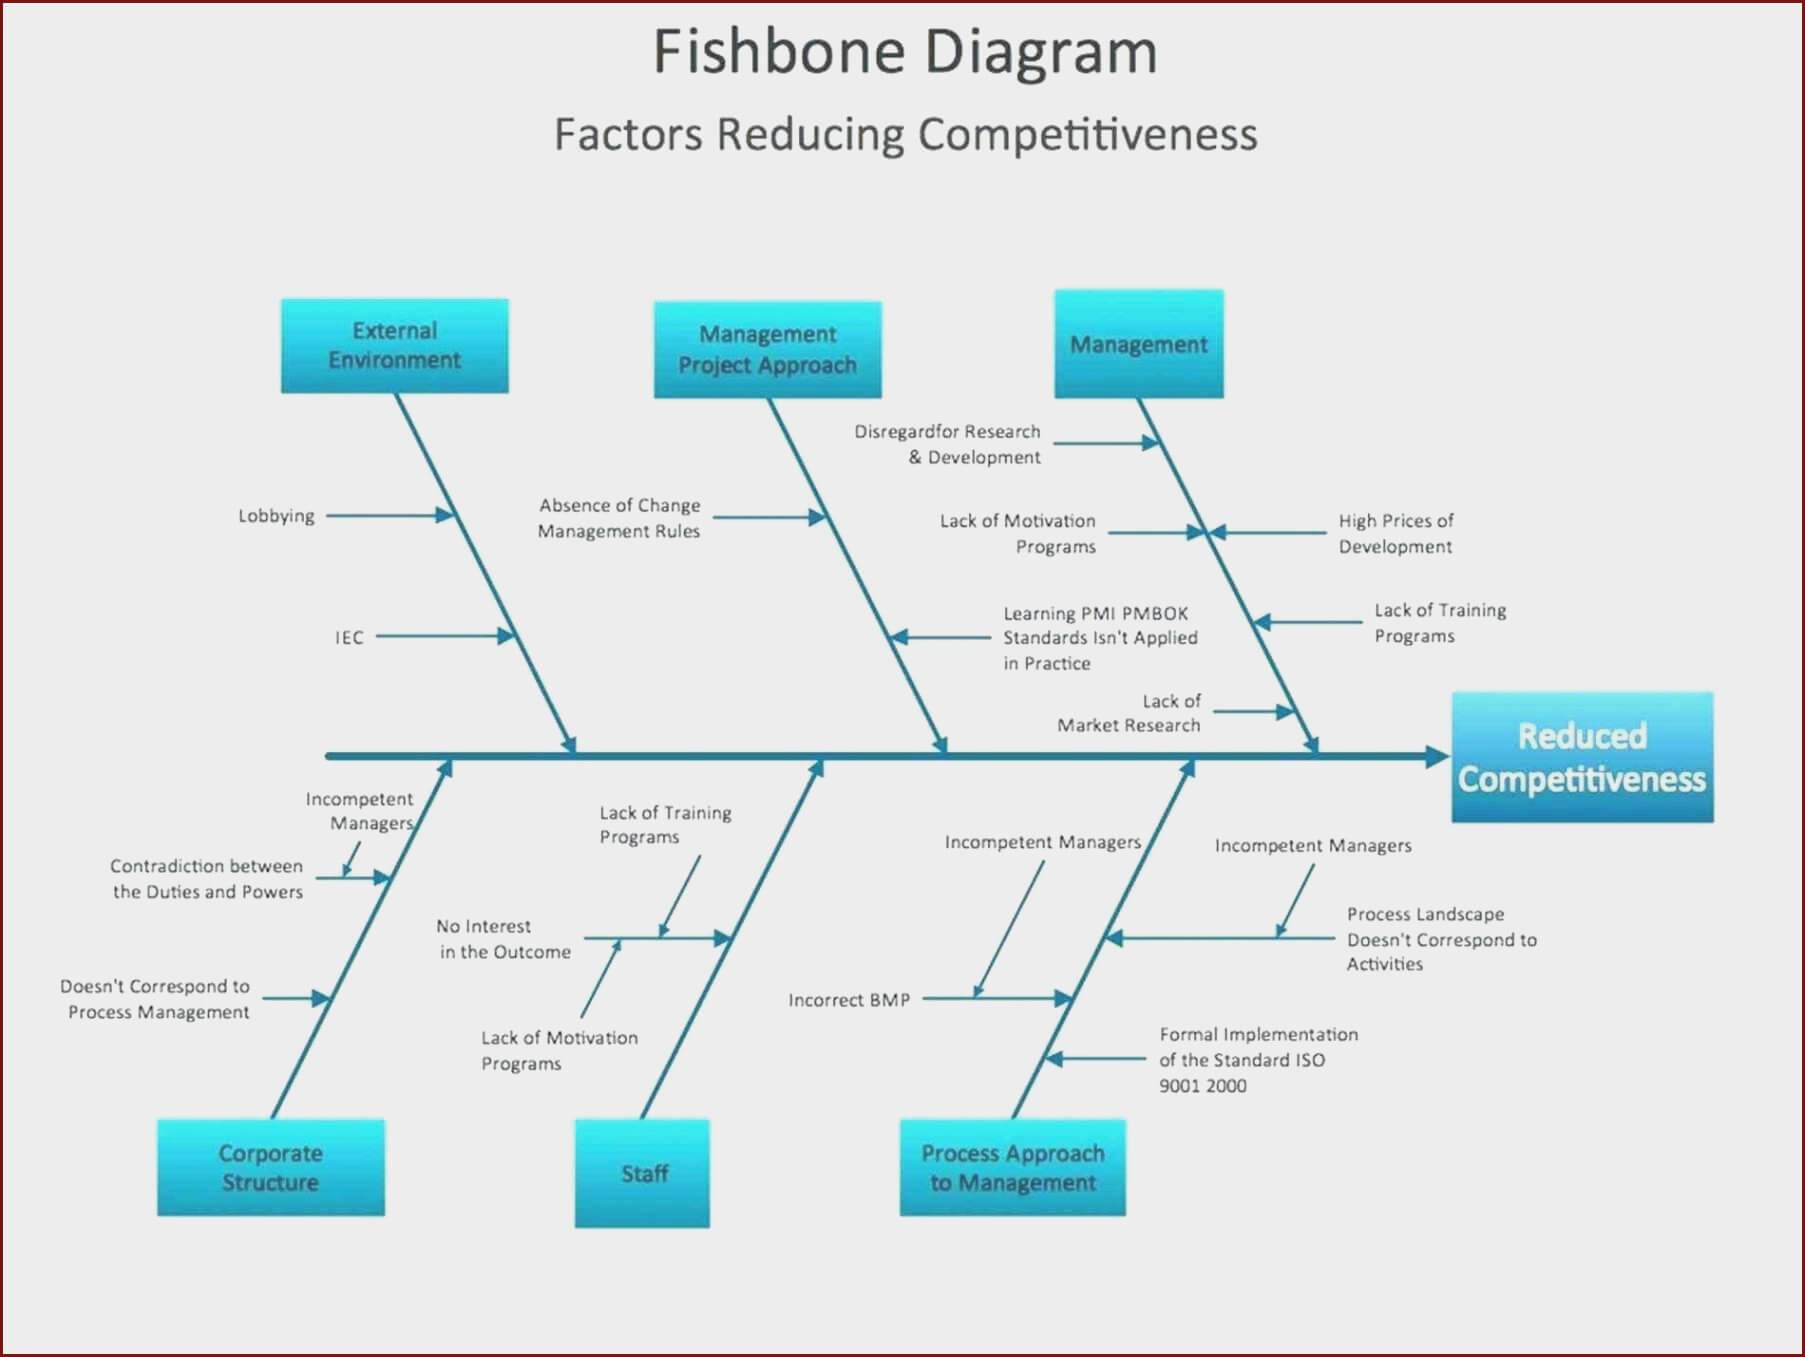 Fishbone Ishikawa Diagram Template At Manuals Library Within Ishikawa Diagram Template Word